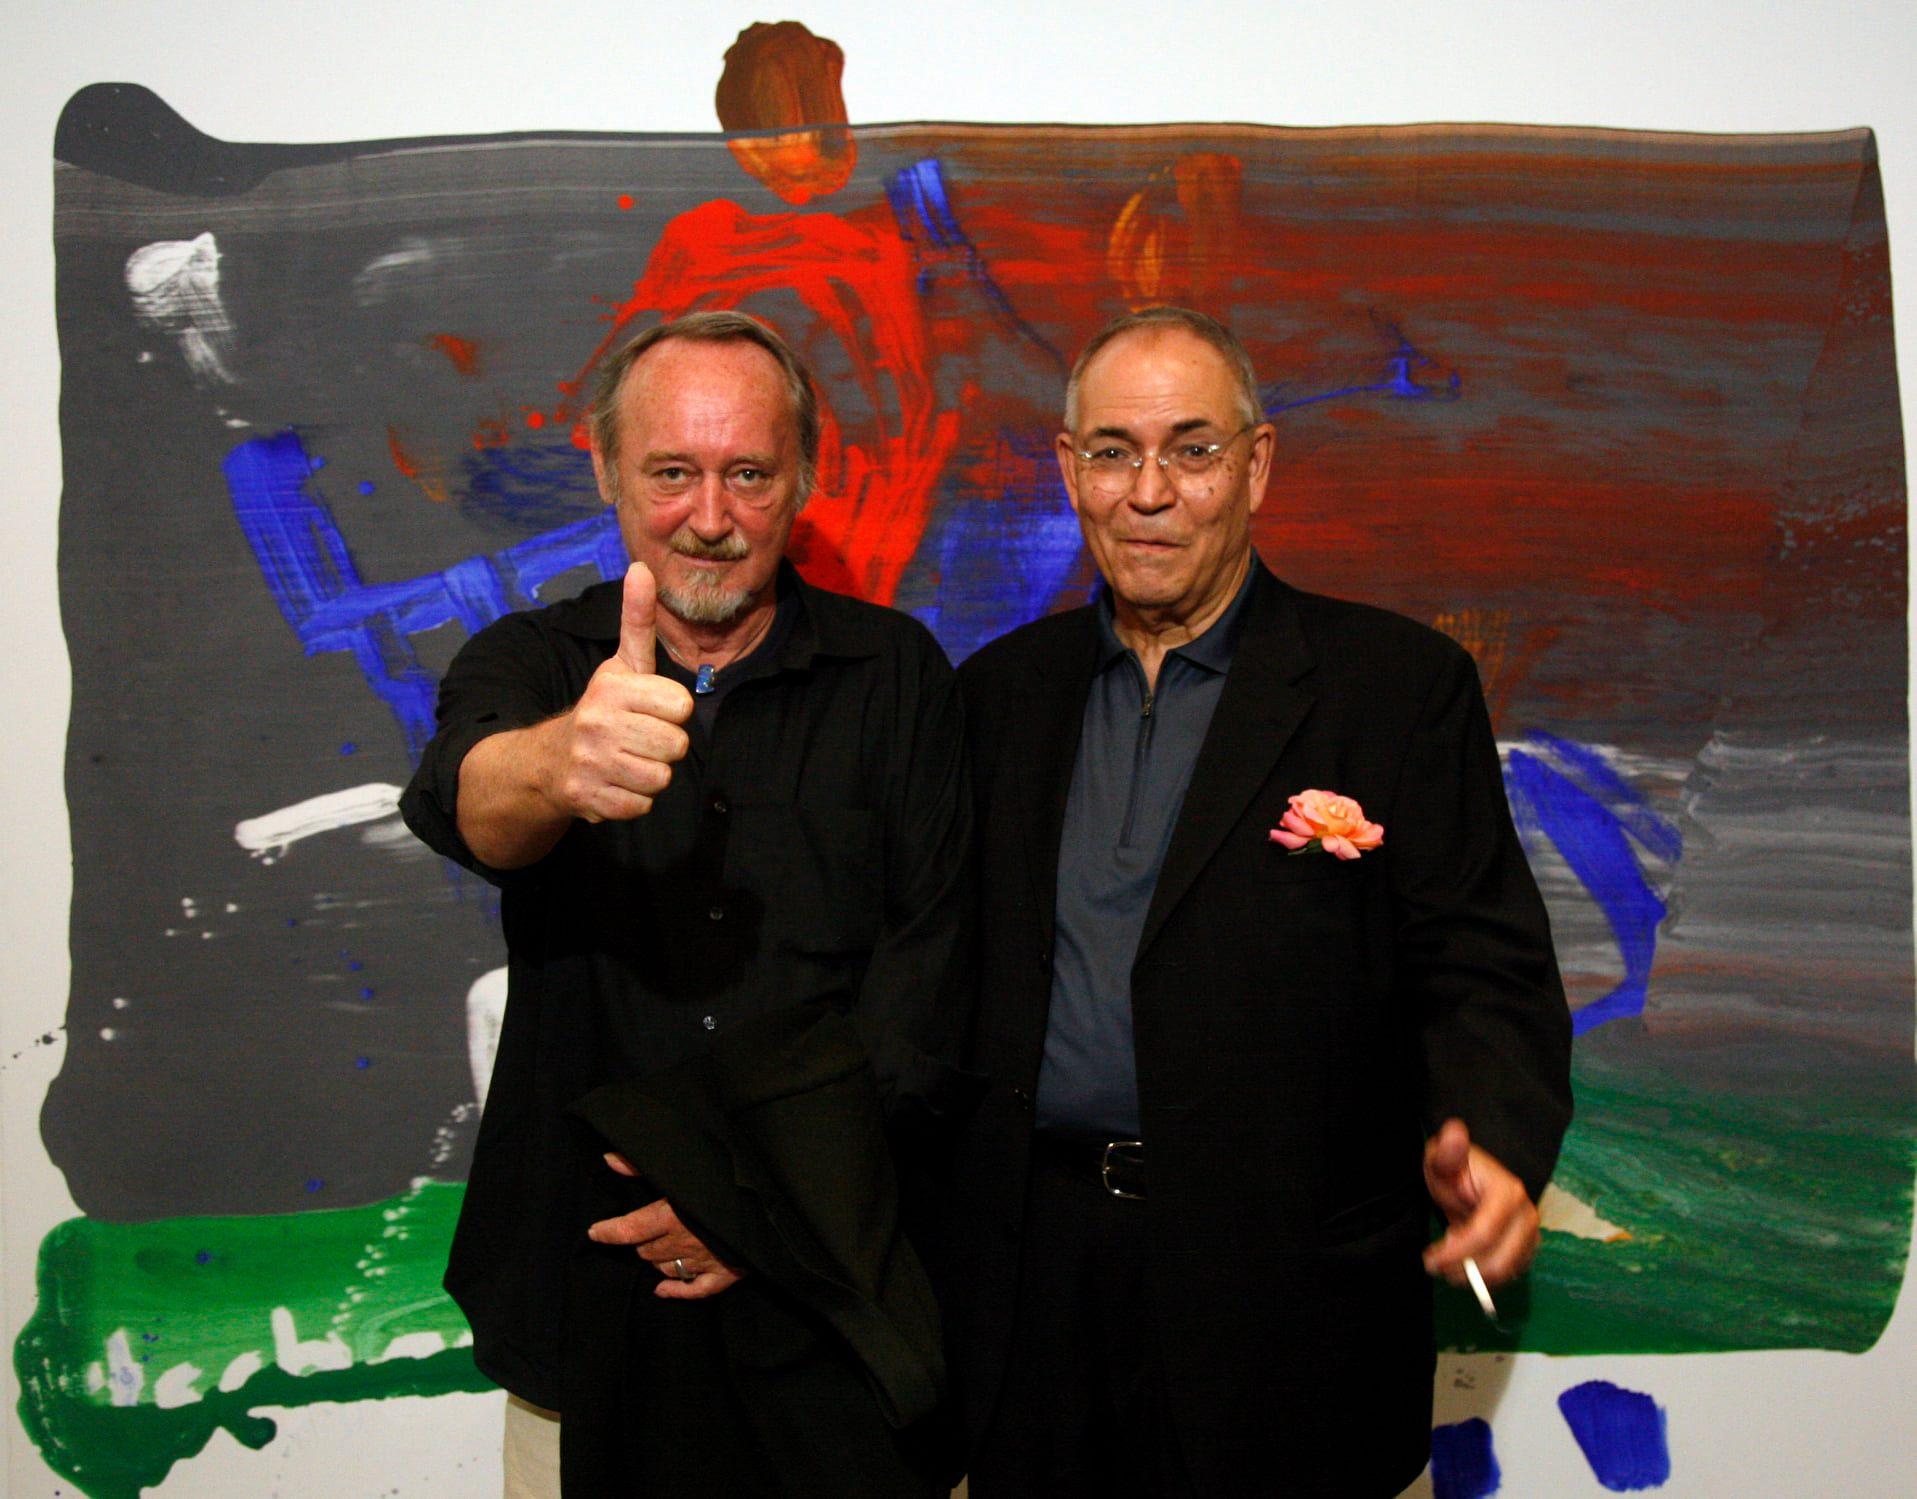 Karl Horst Hödicke & Michael J. Wewerka, © Jirka Jansch, Berlin 2006